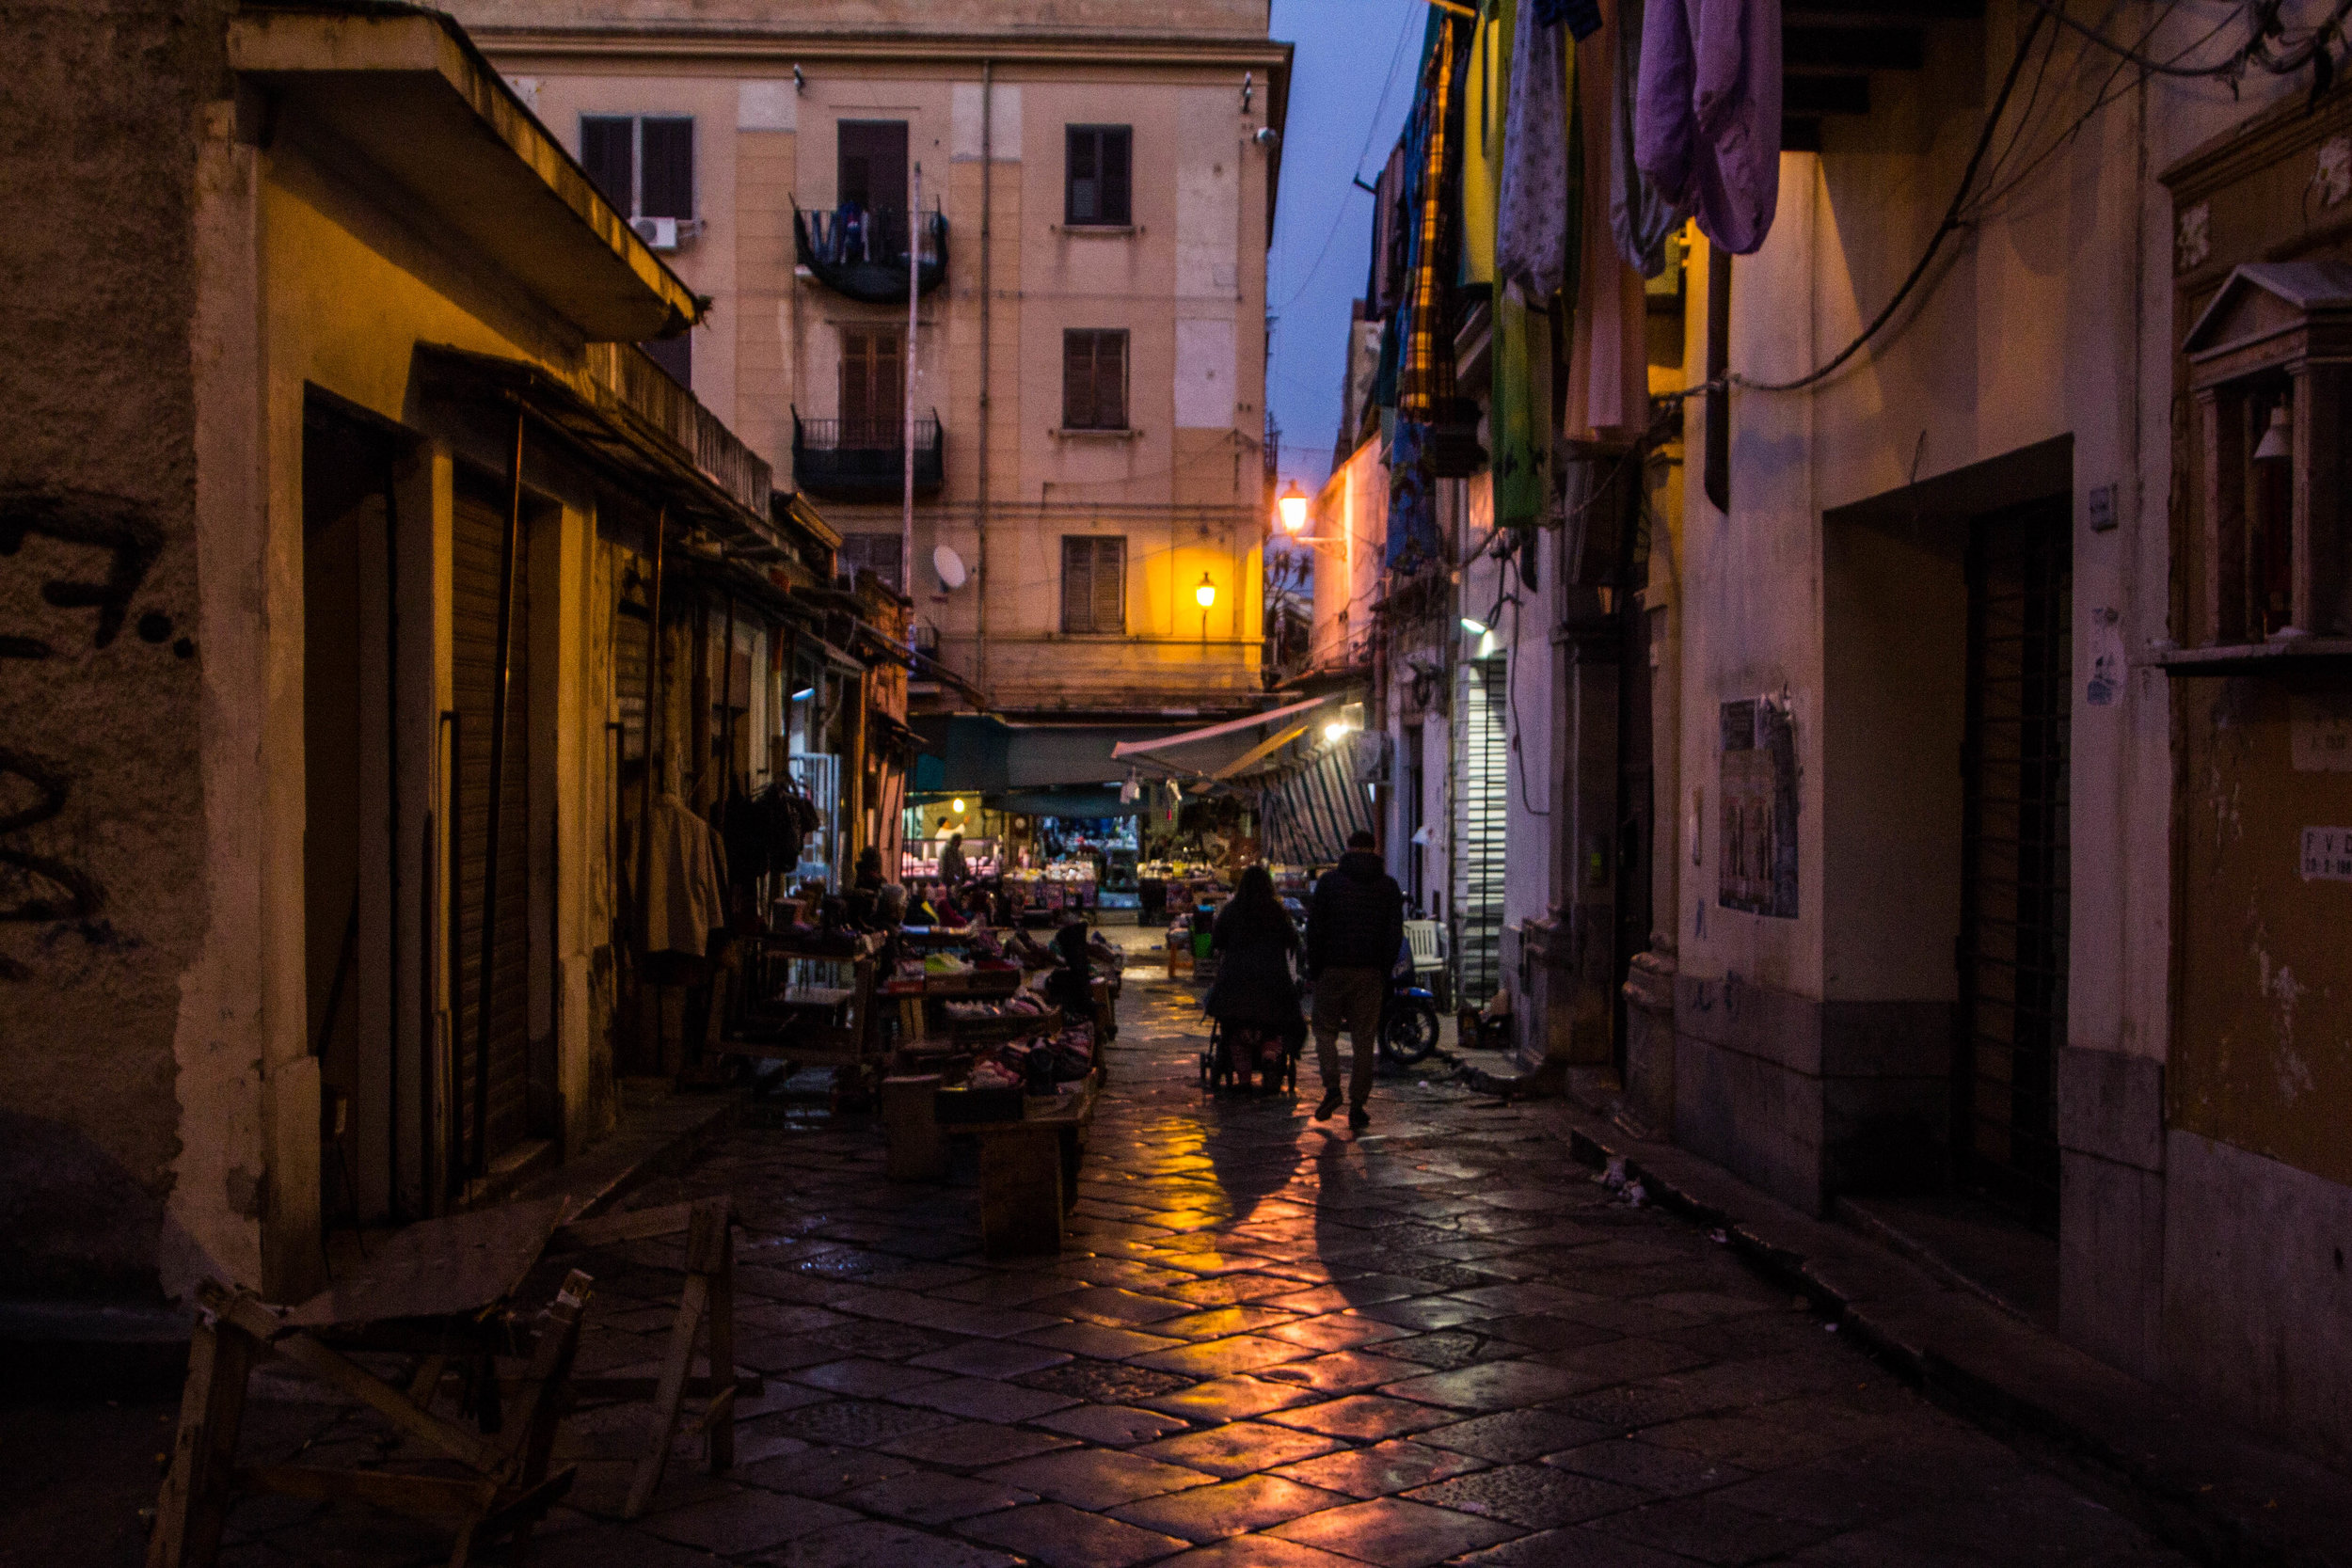 streets-palermo-sicily-62.jpg